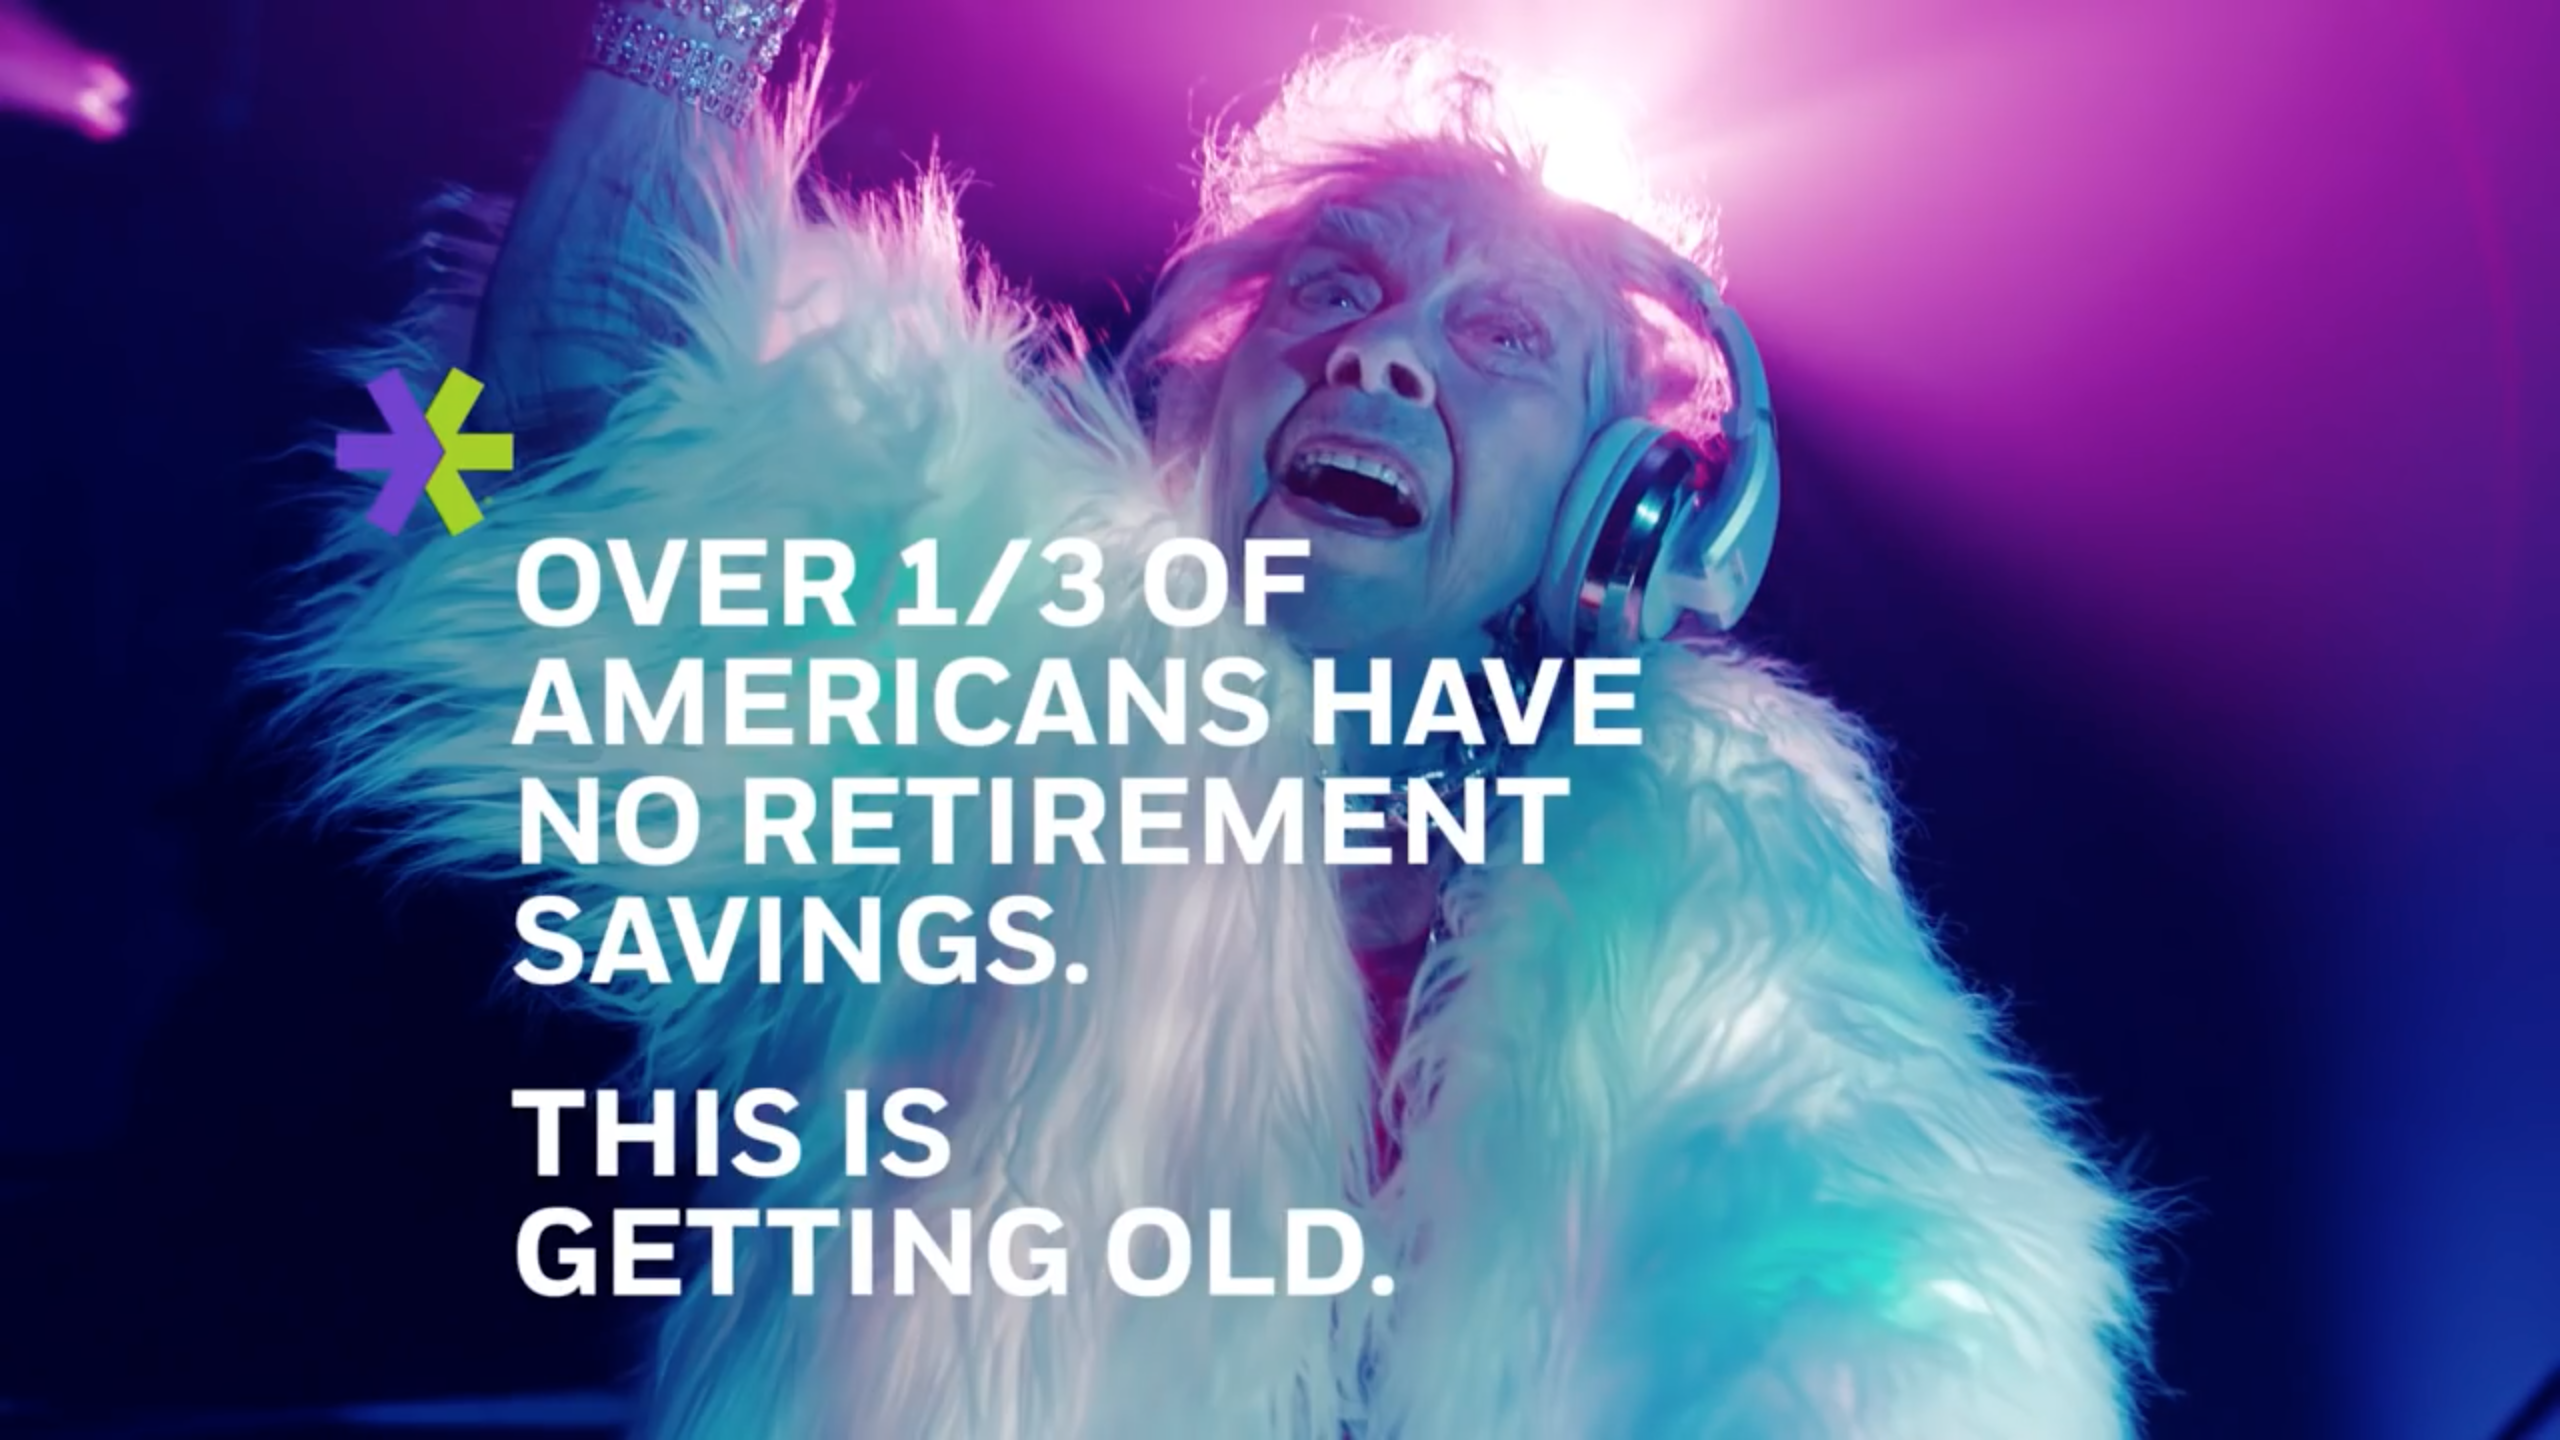 E Trade Super Bowl 2018 Retirement Commercial Shows Crisis Money